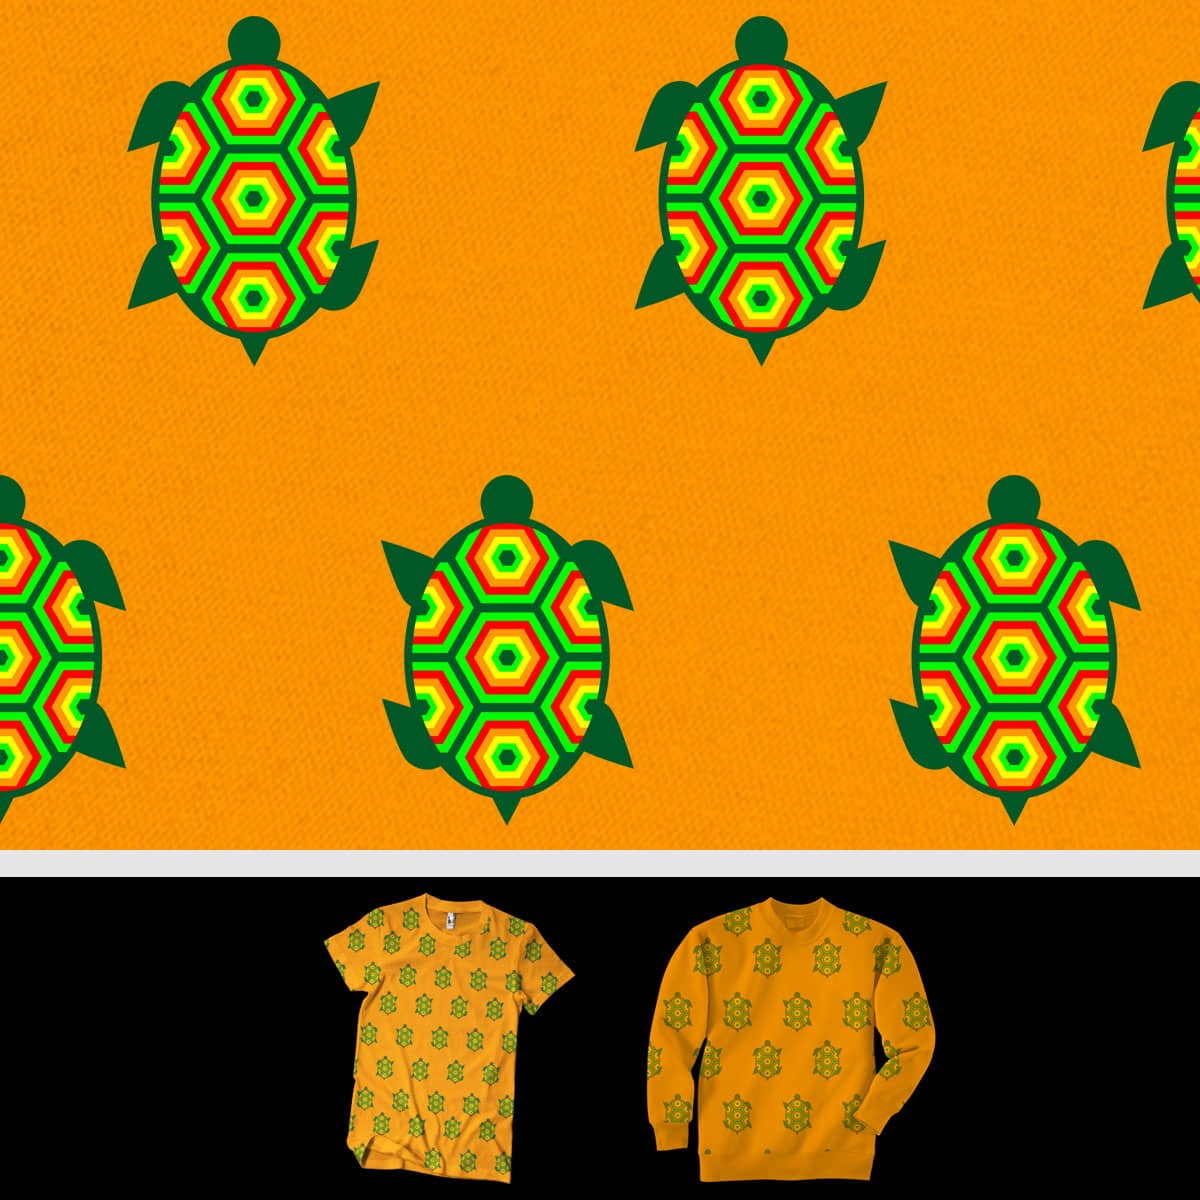 Turtle Run by SteveOramA on Threadless